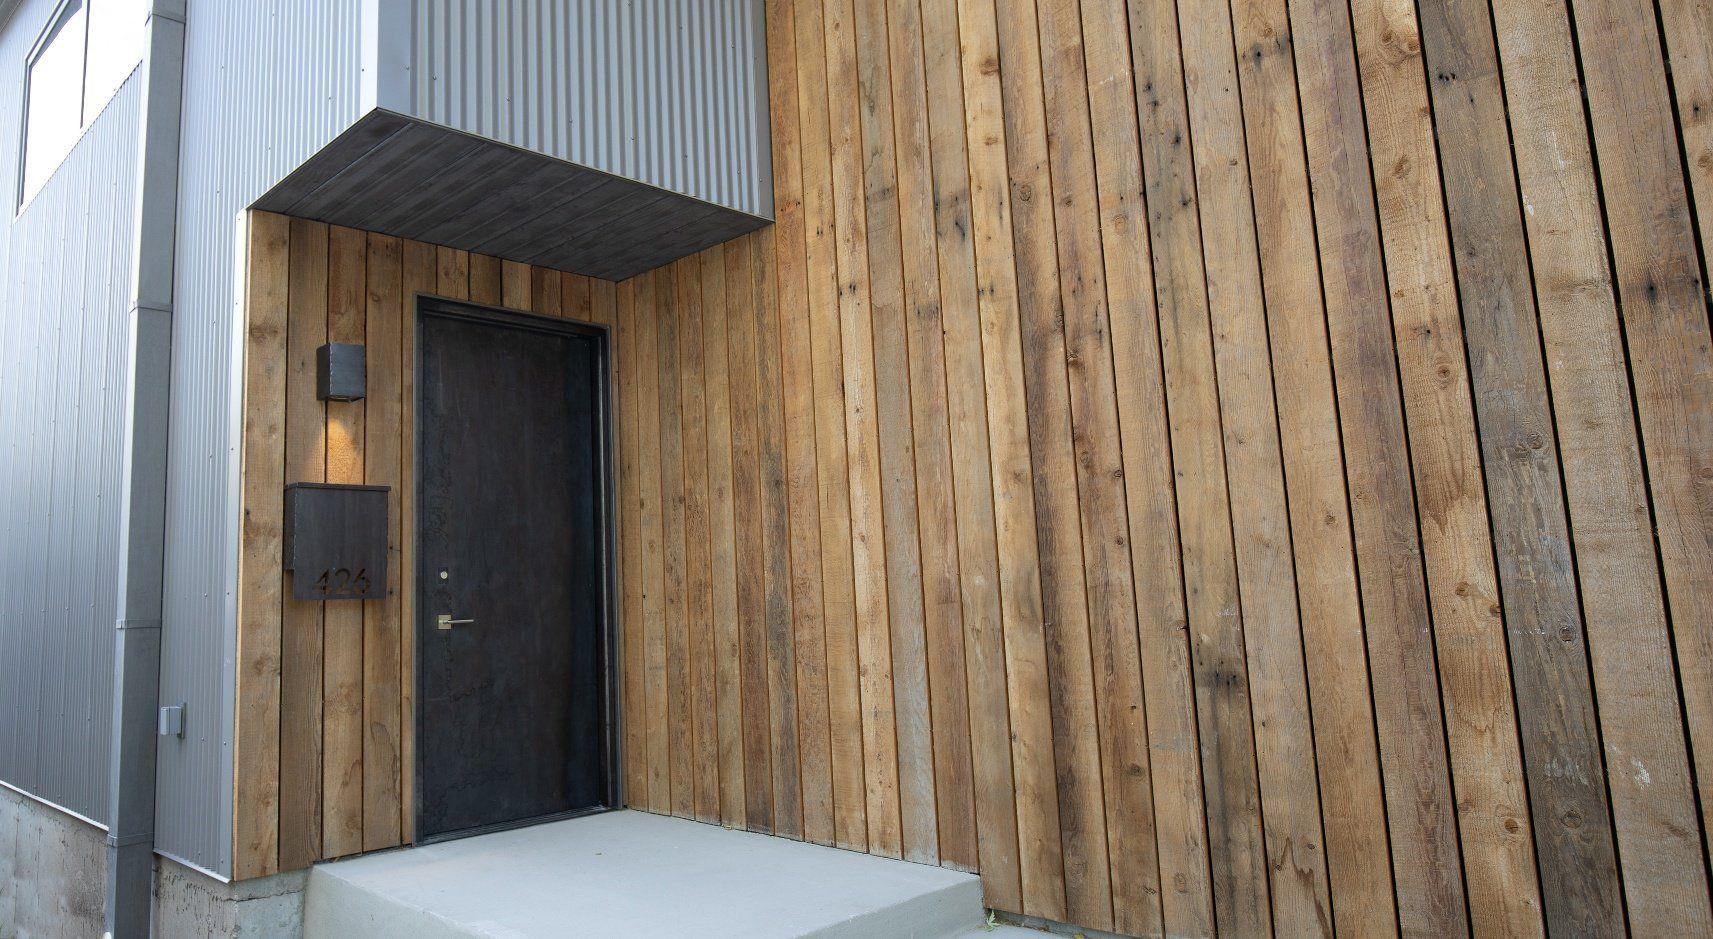 Using Metal Siding On A Modern Home House Cladding Metal Siding Modern House